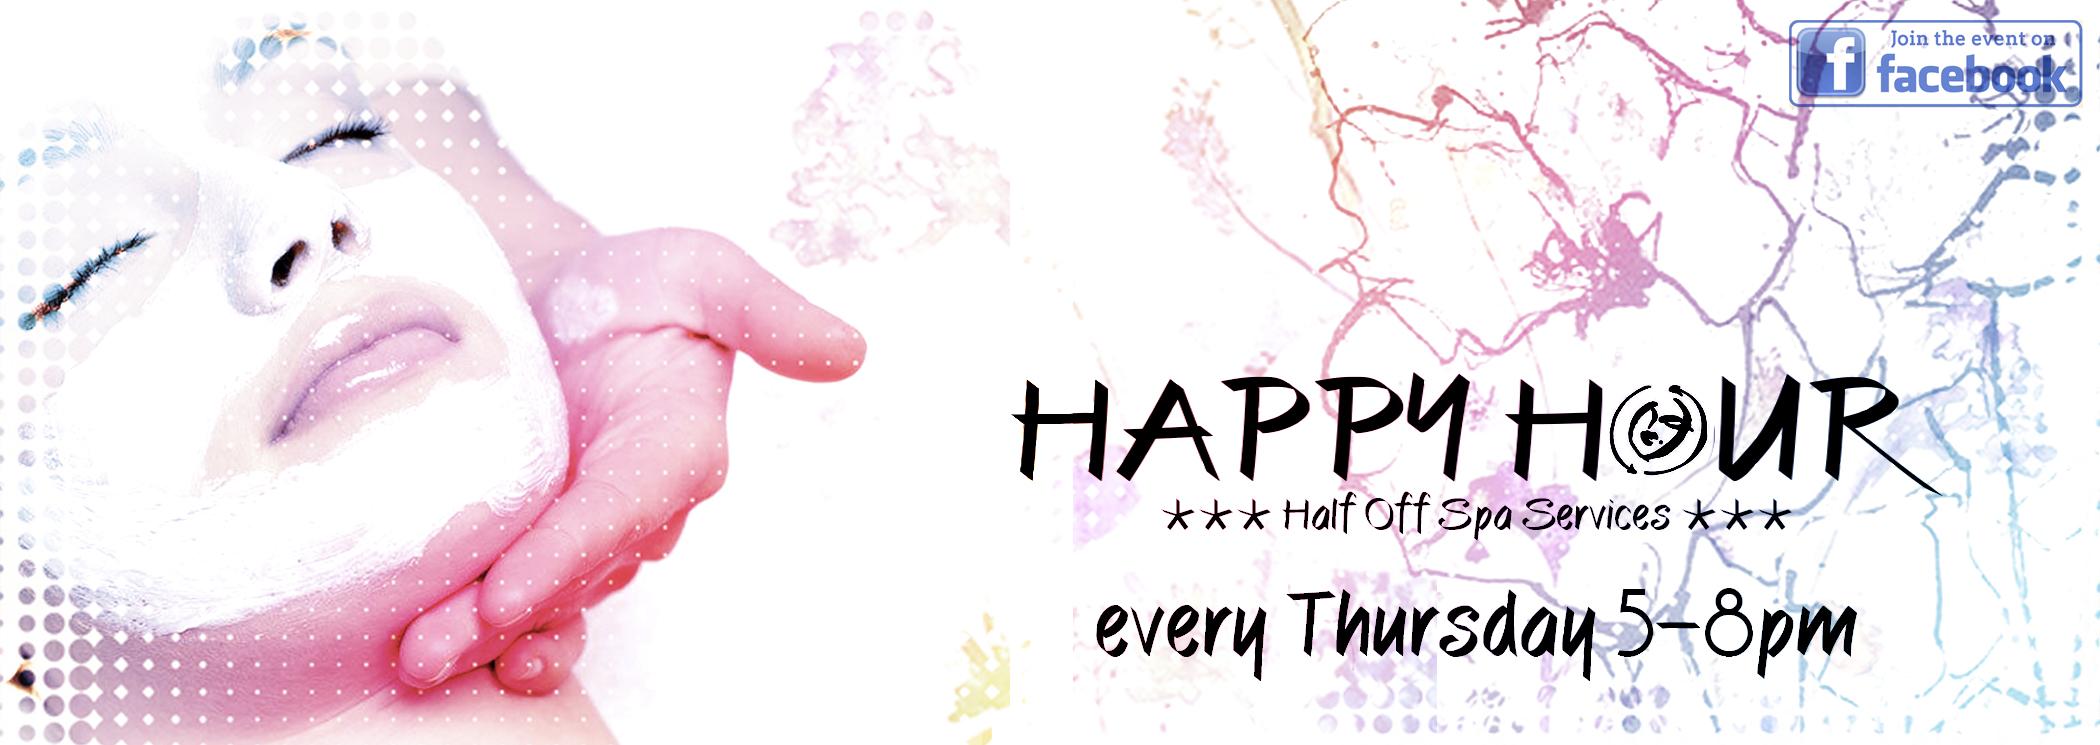 HappyHourBanner.jpg